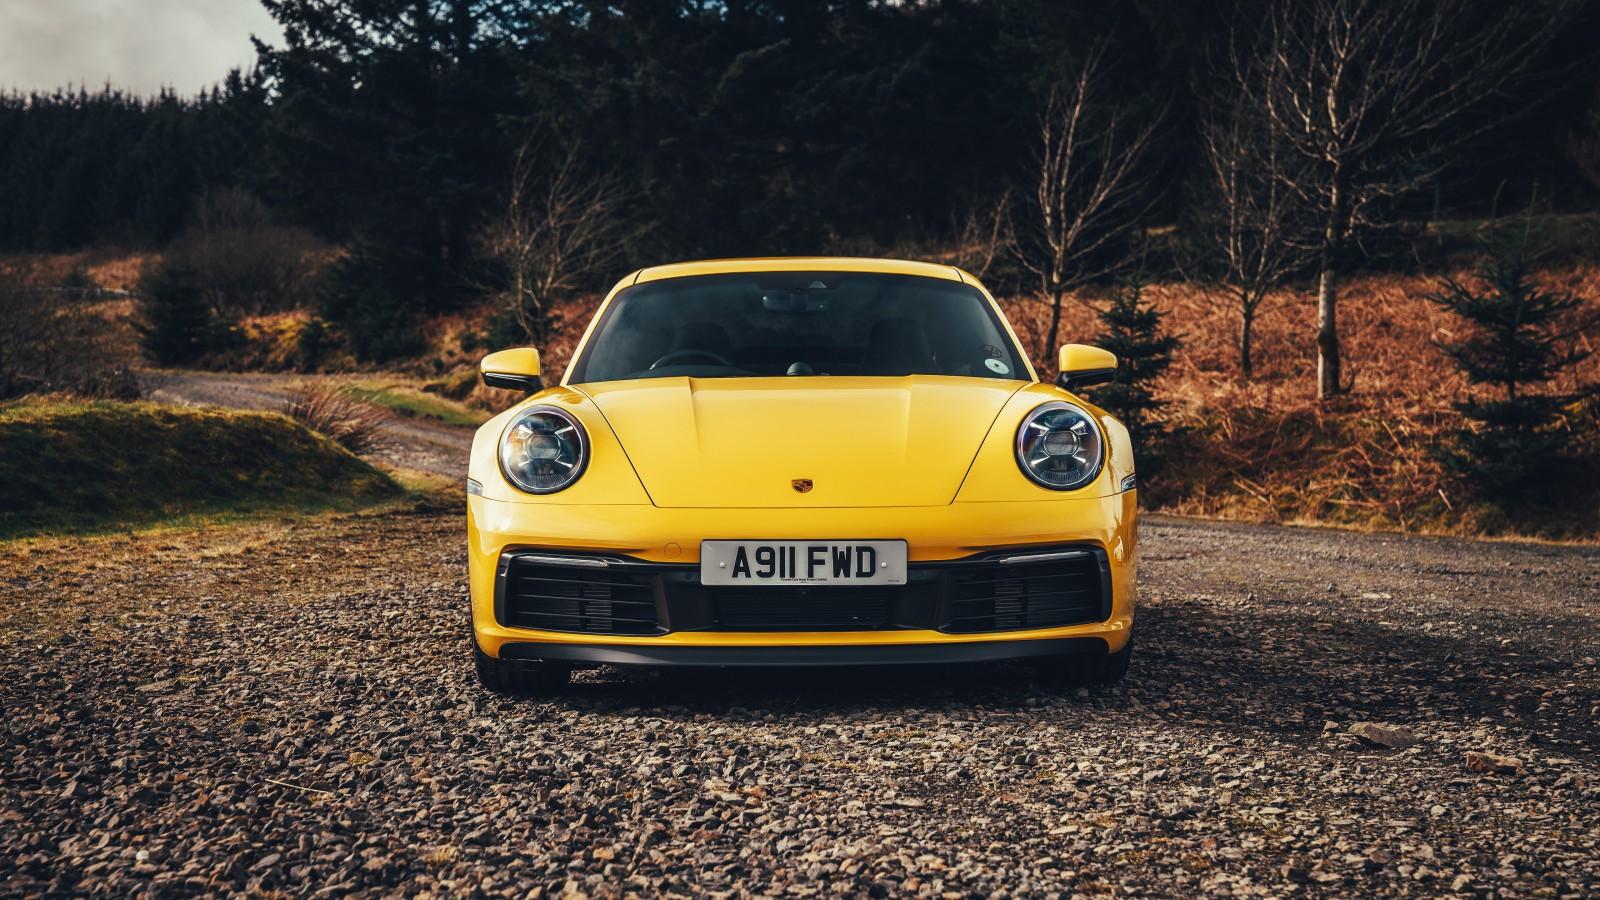 Porsche Carrera S >> Porsche 911 Carrera 4S 2019 5K Wallpaper | HD Car ...